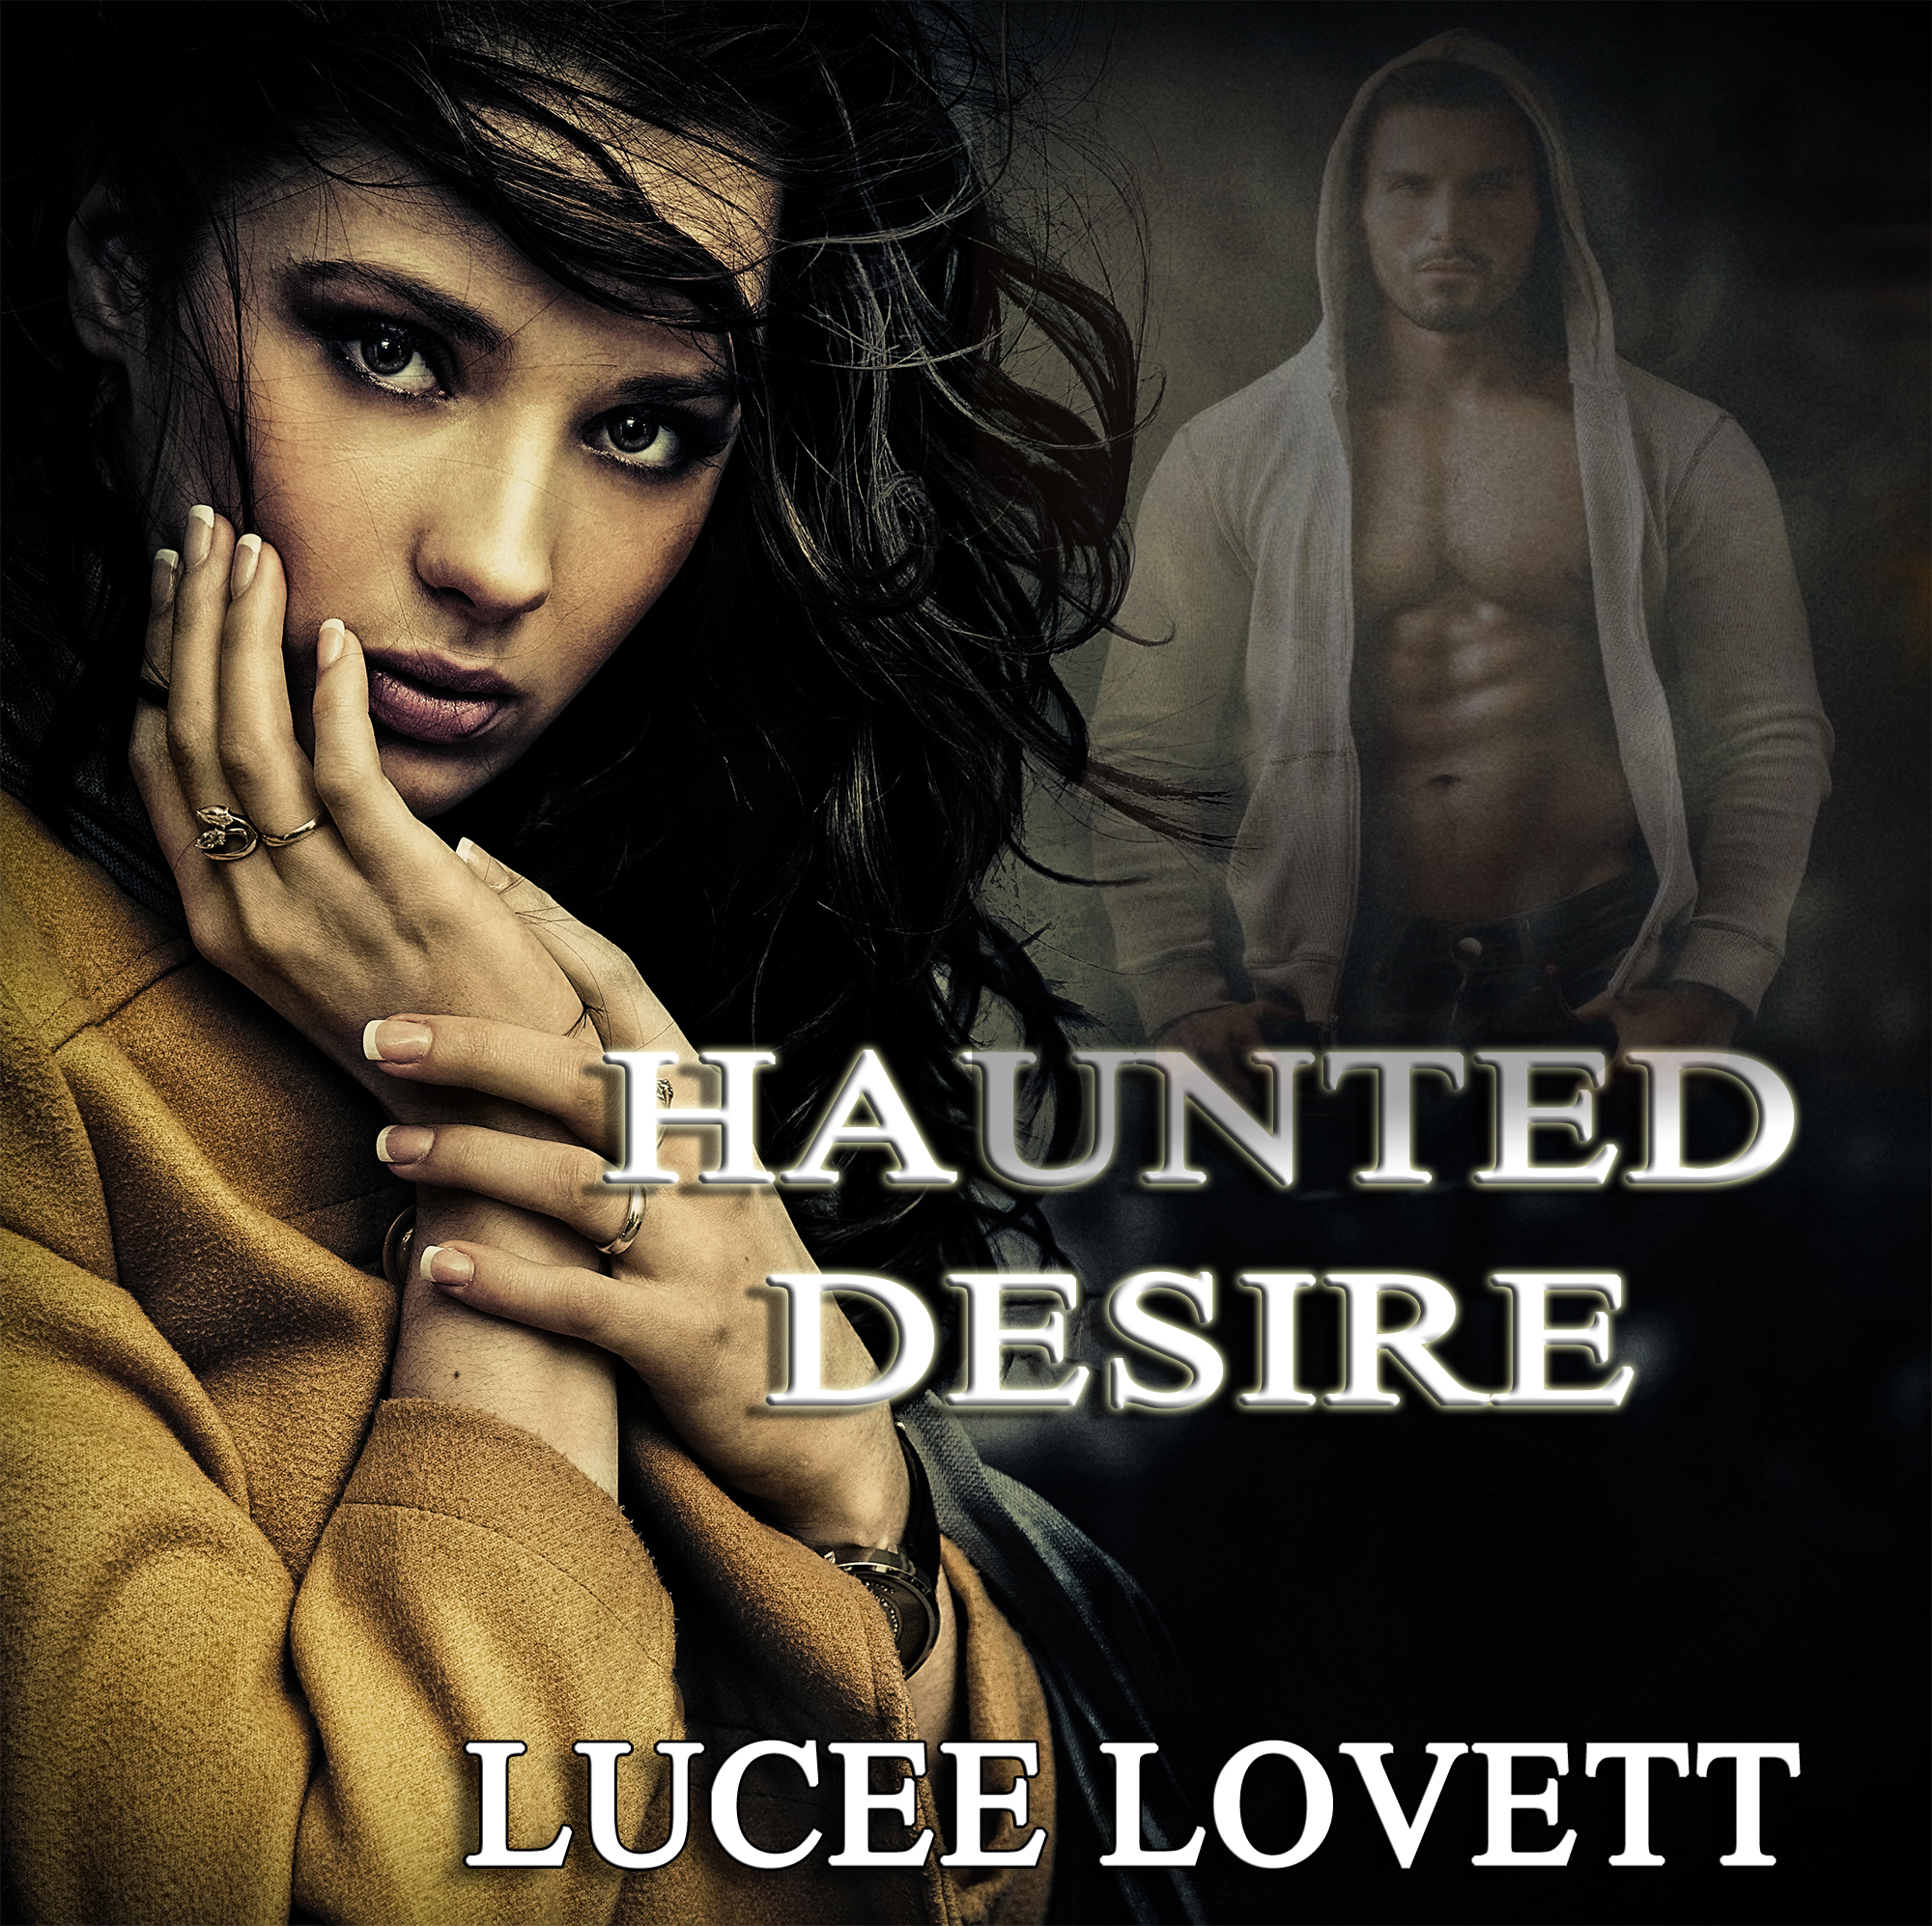 Erotic haunting desire photo 609